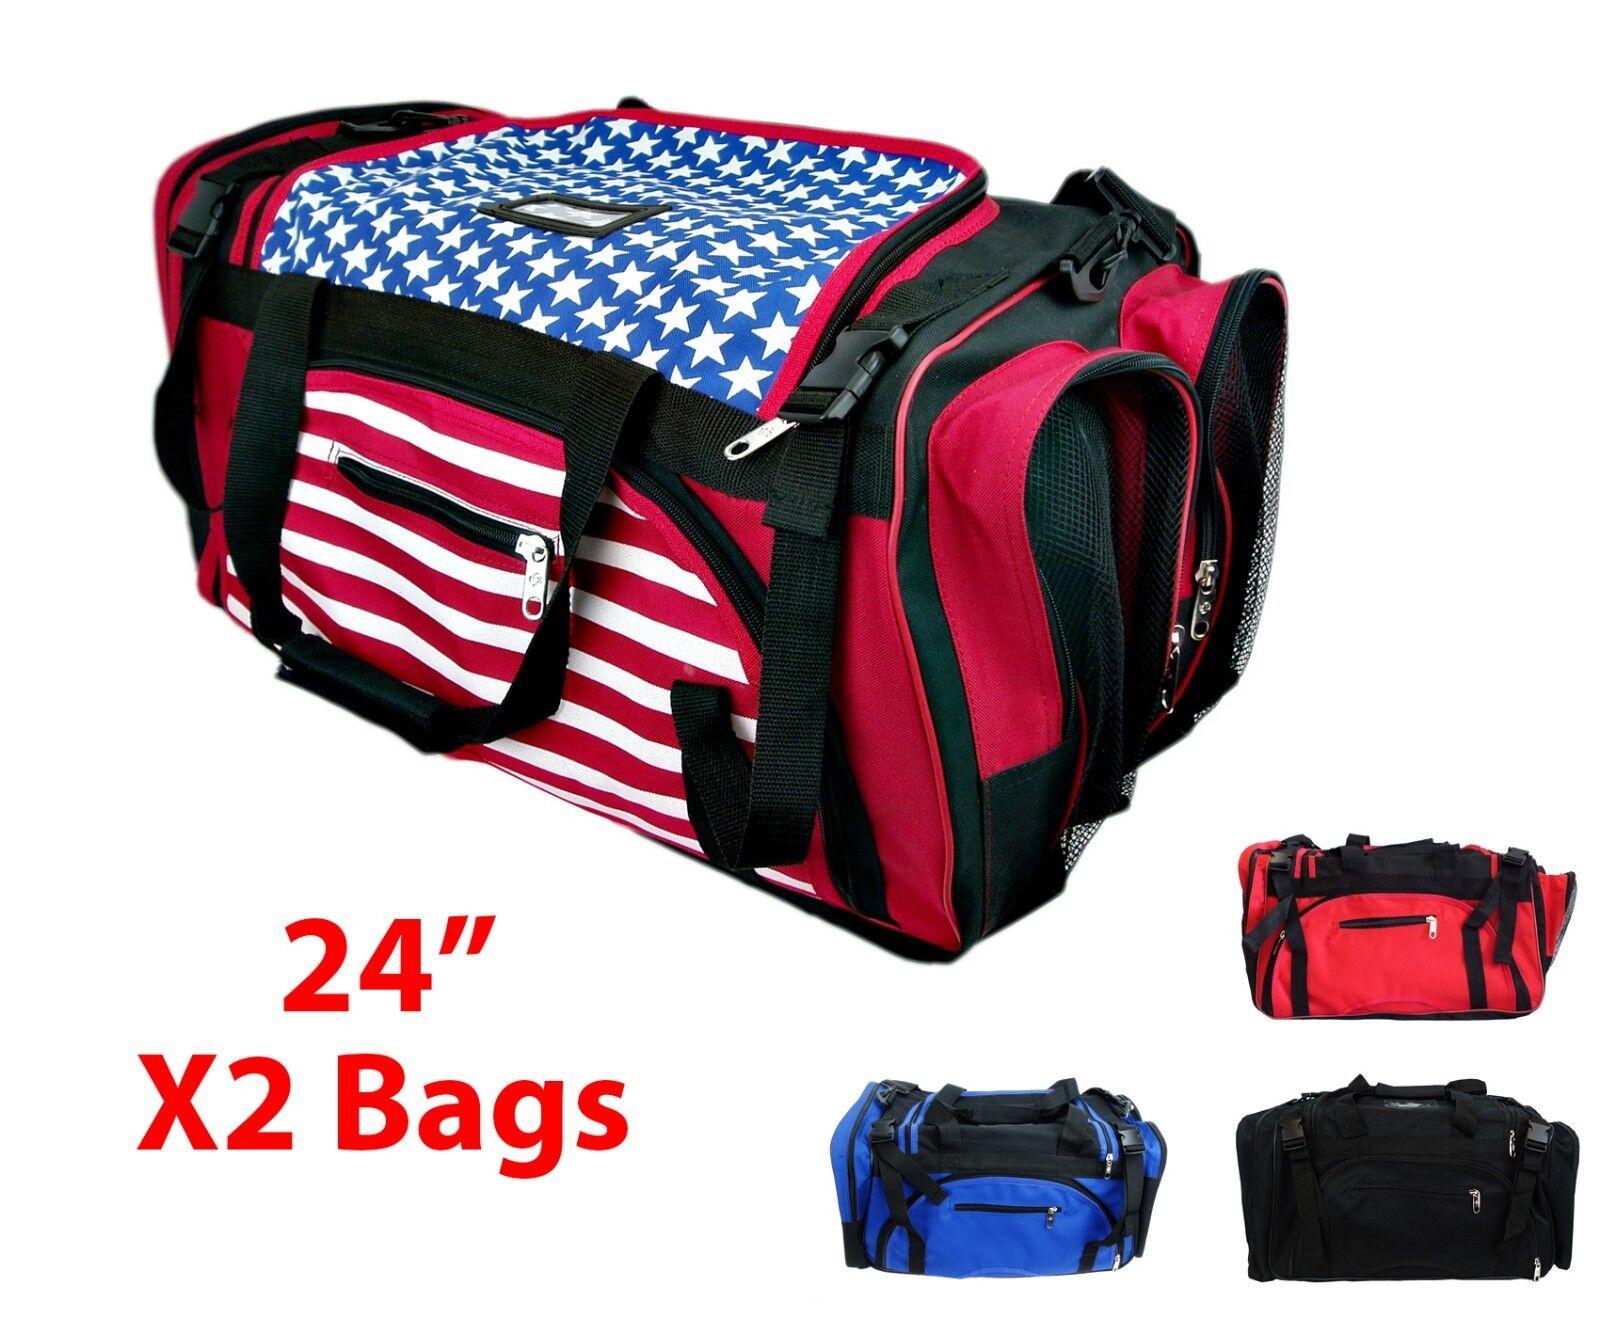 X2 Equipment Gear Bag Taekwondo Karate MMA Martial  Arts Deluxe 24  Travel Bag  comfortable